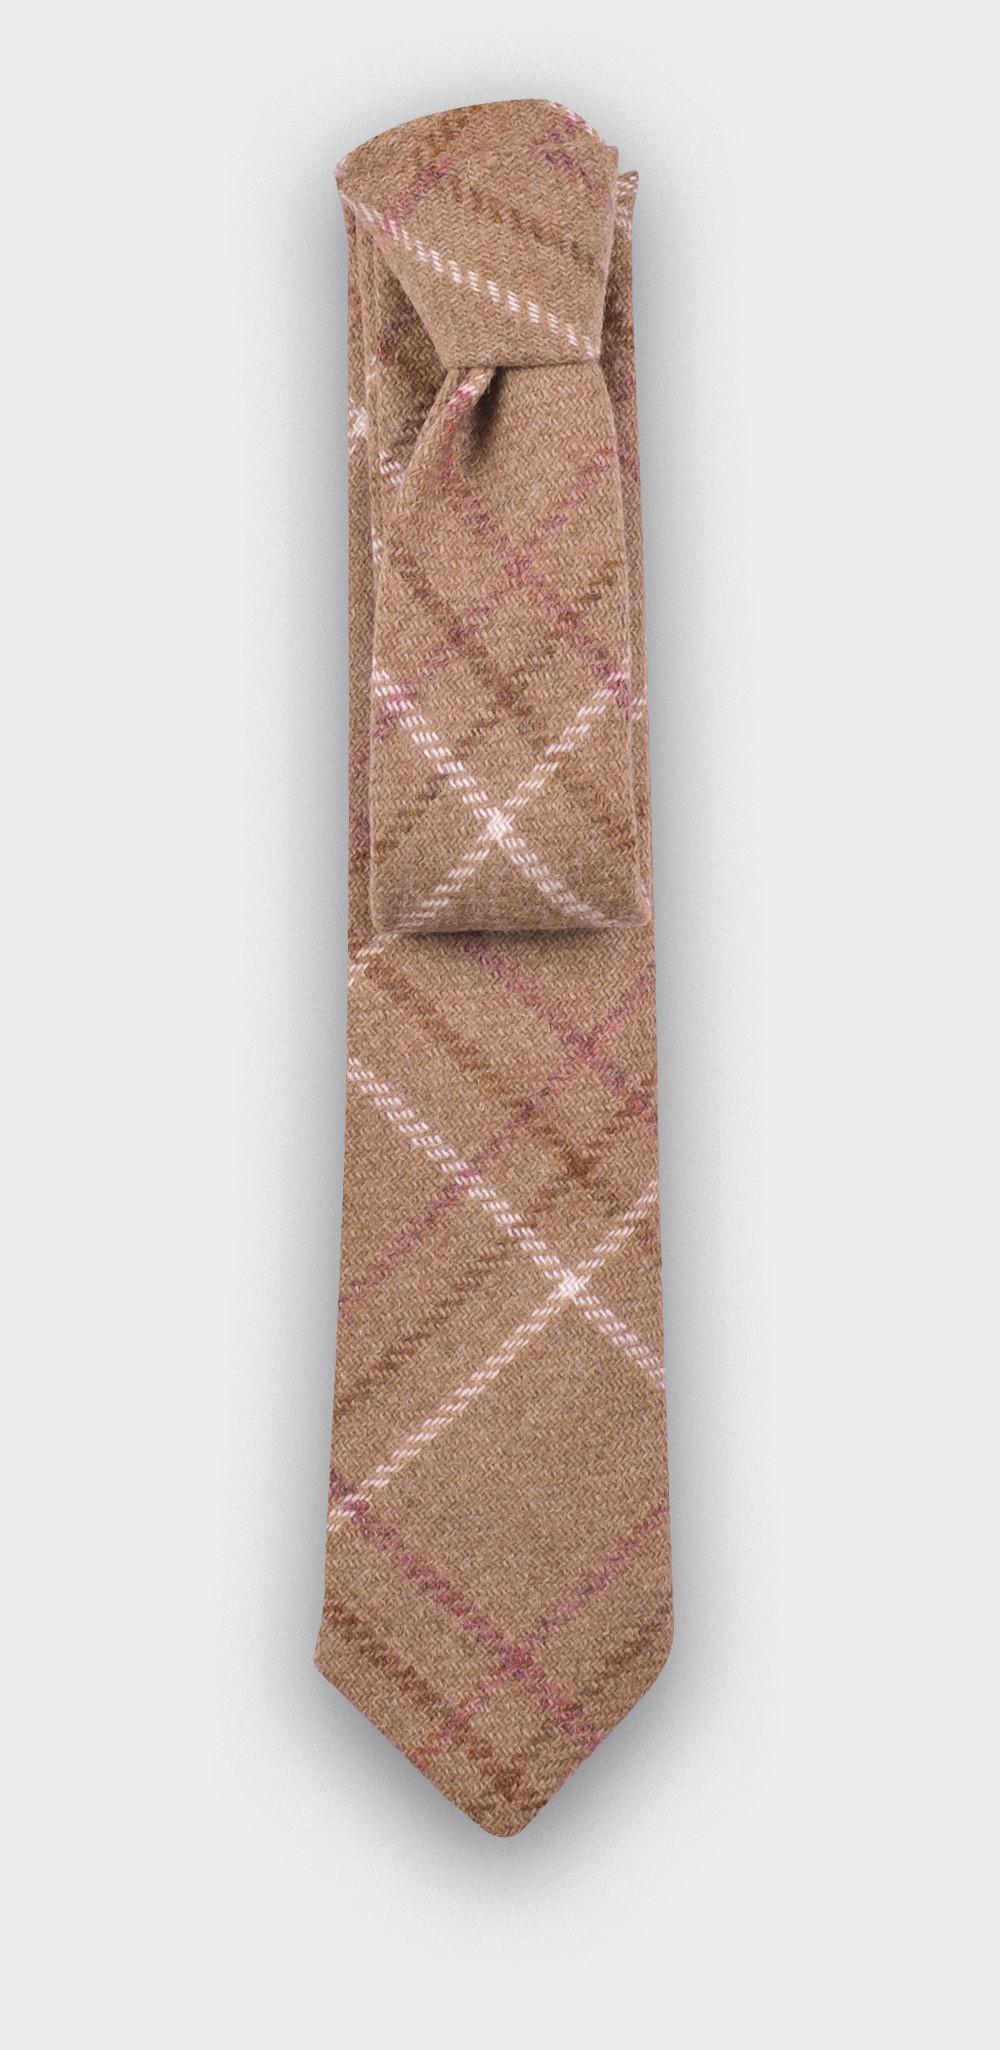 Cravate Tweed Carreaux Beige - cinabre paris